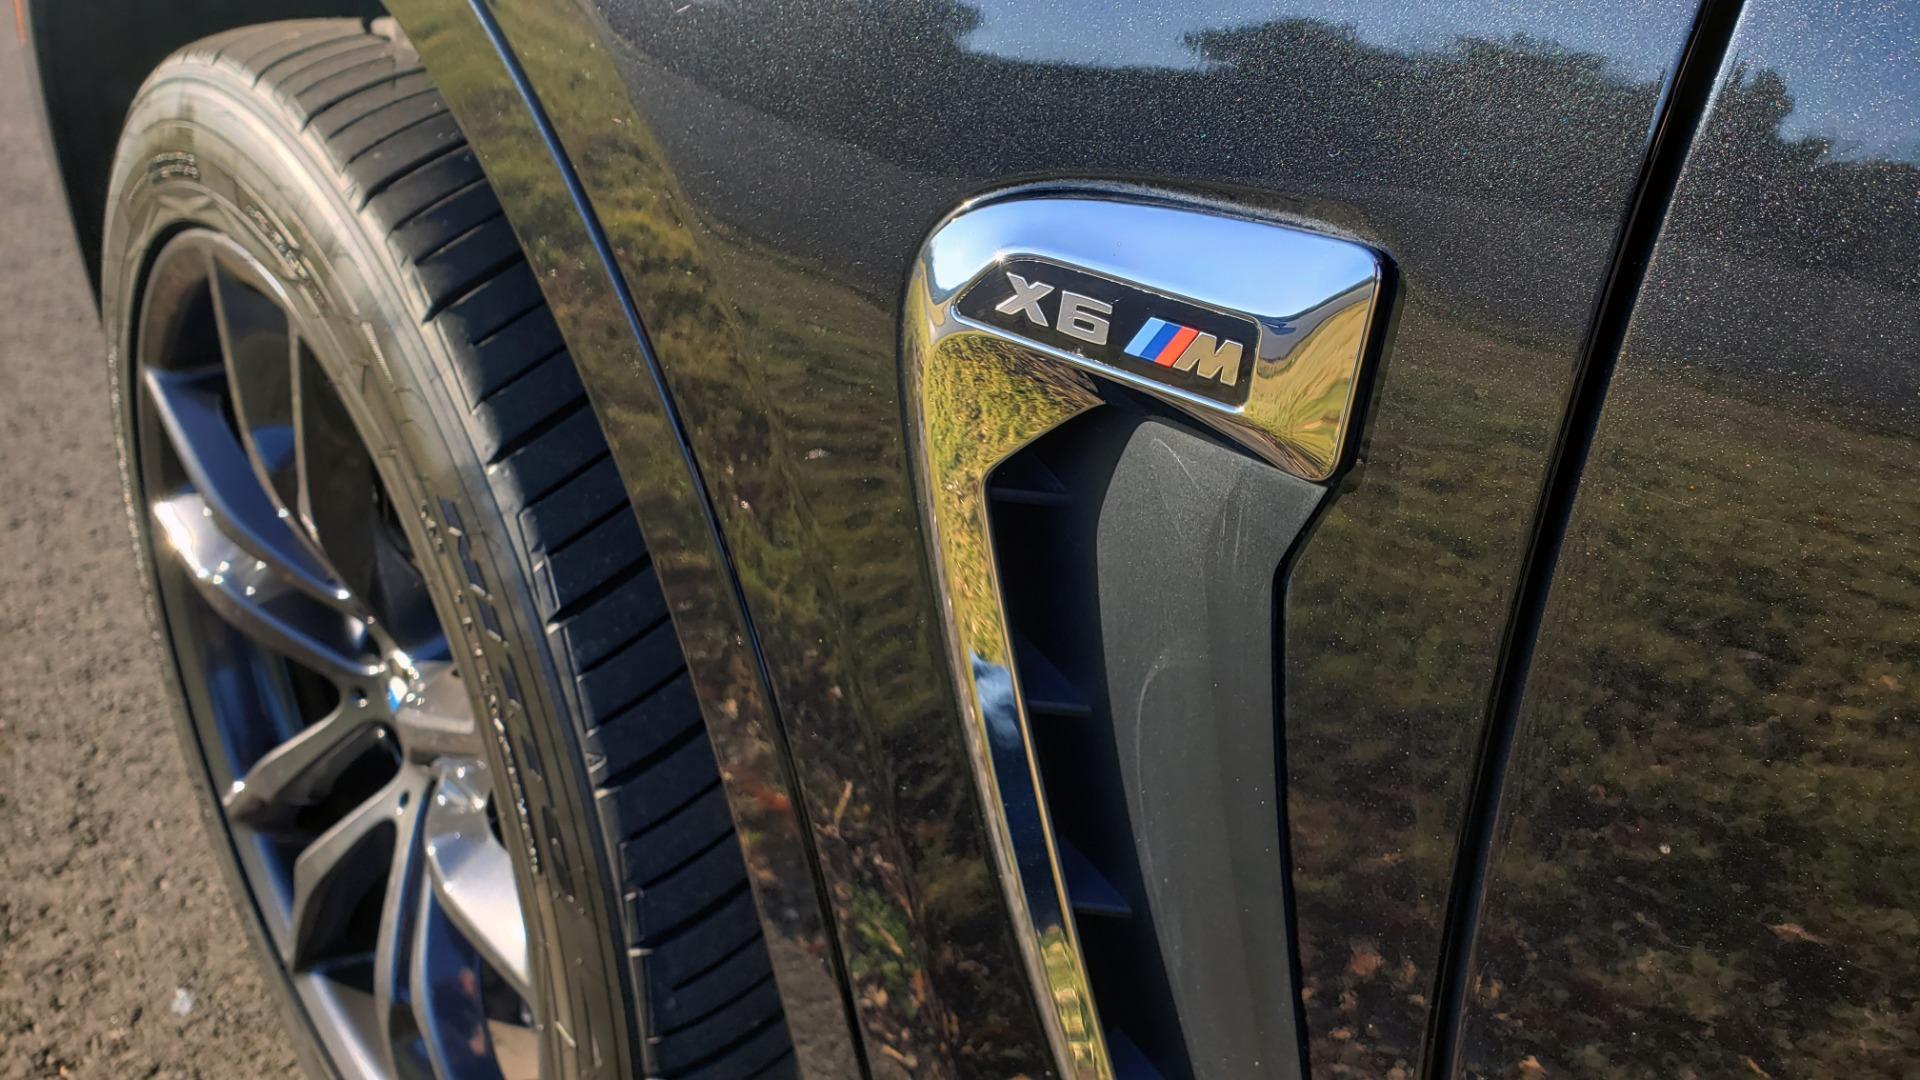 Used 2016 BMW X6 M EXEC PKG / DRVR ASST / NAV / SUNROOF / BLIND SPOT / REARVIEW for sale Sold at Formula Imports in Charlotte NC 28227 10